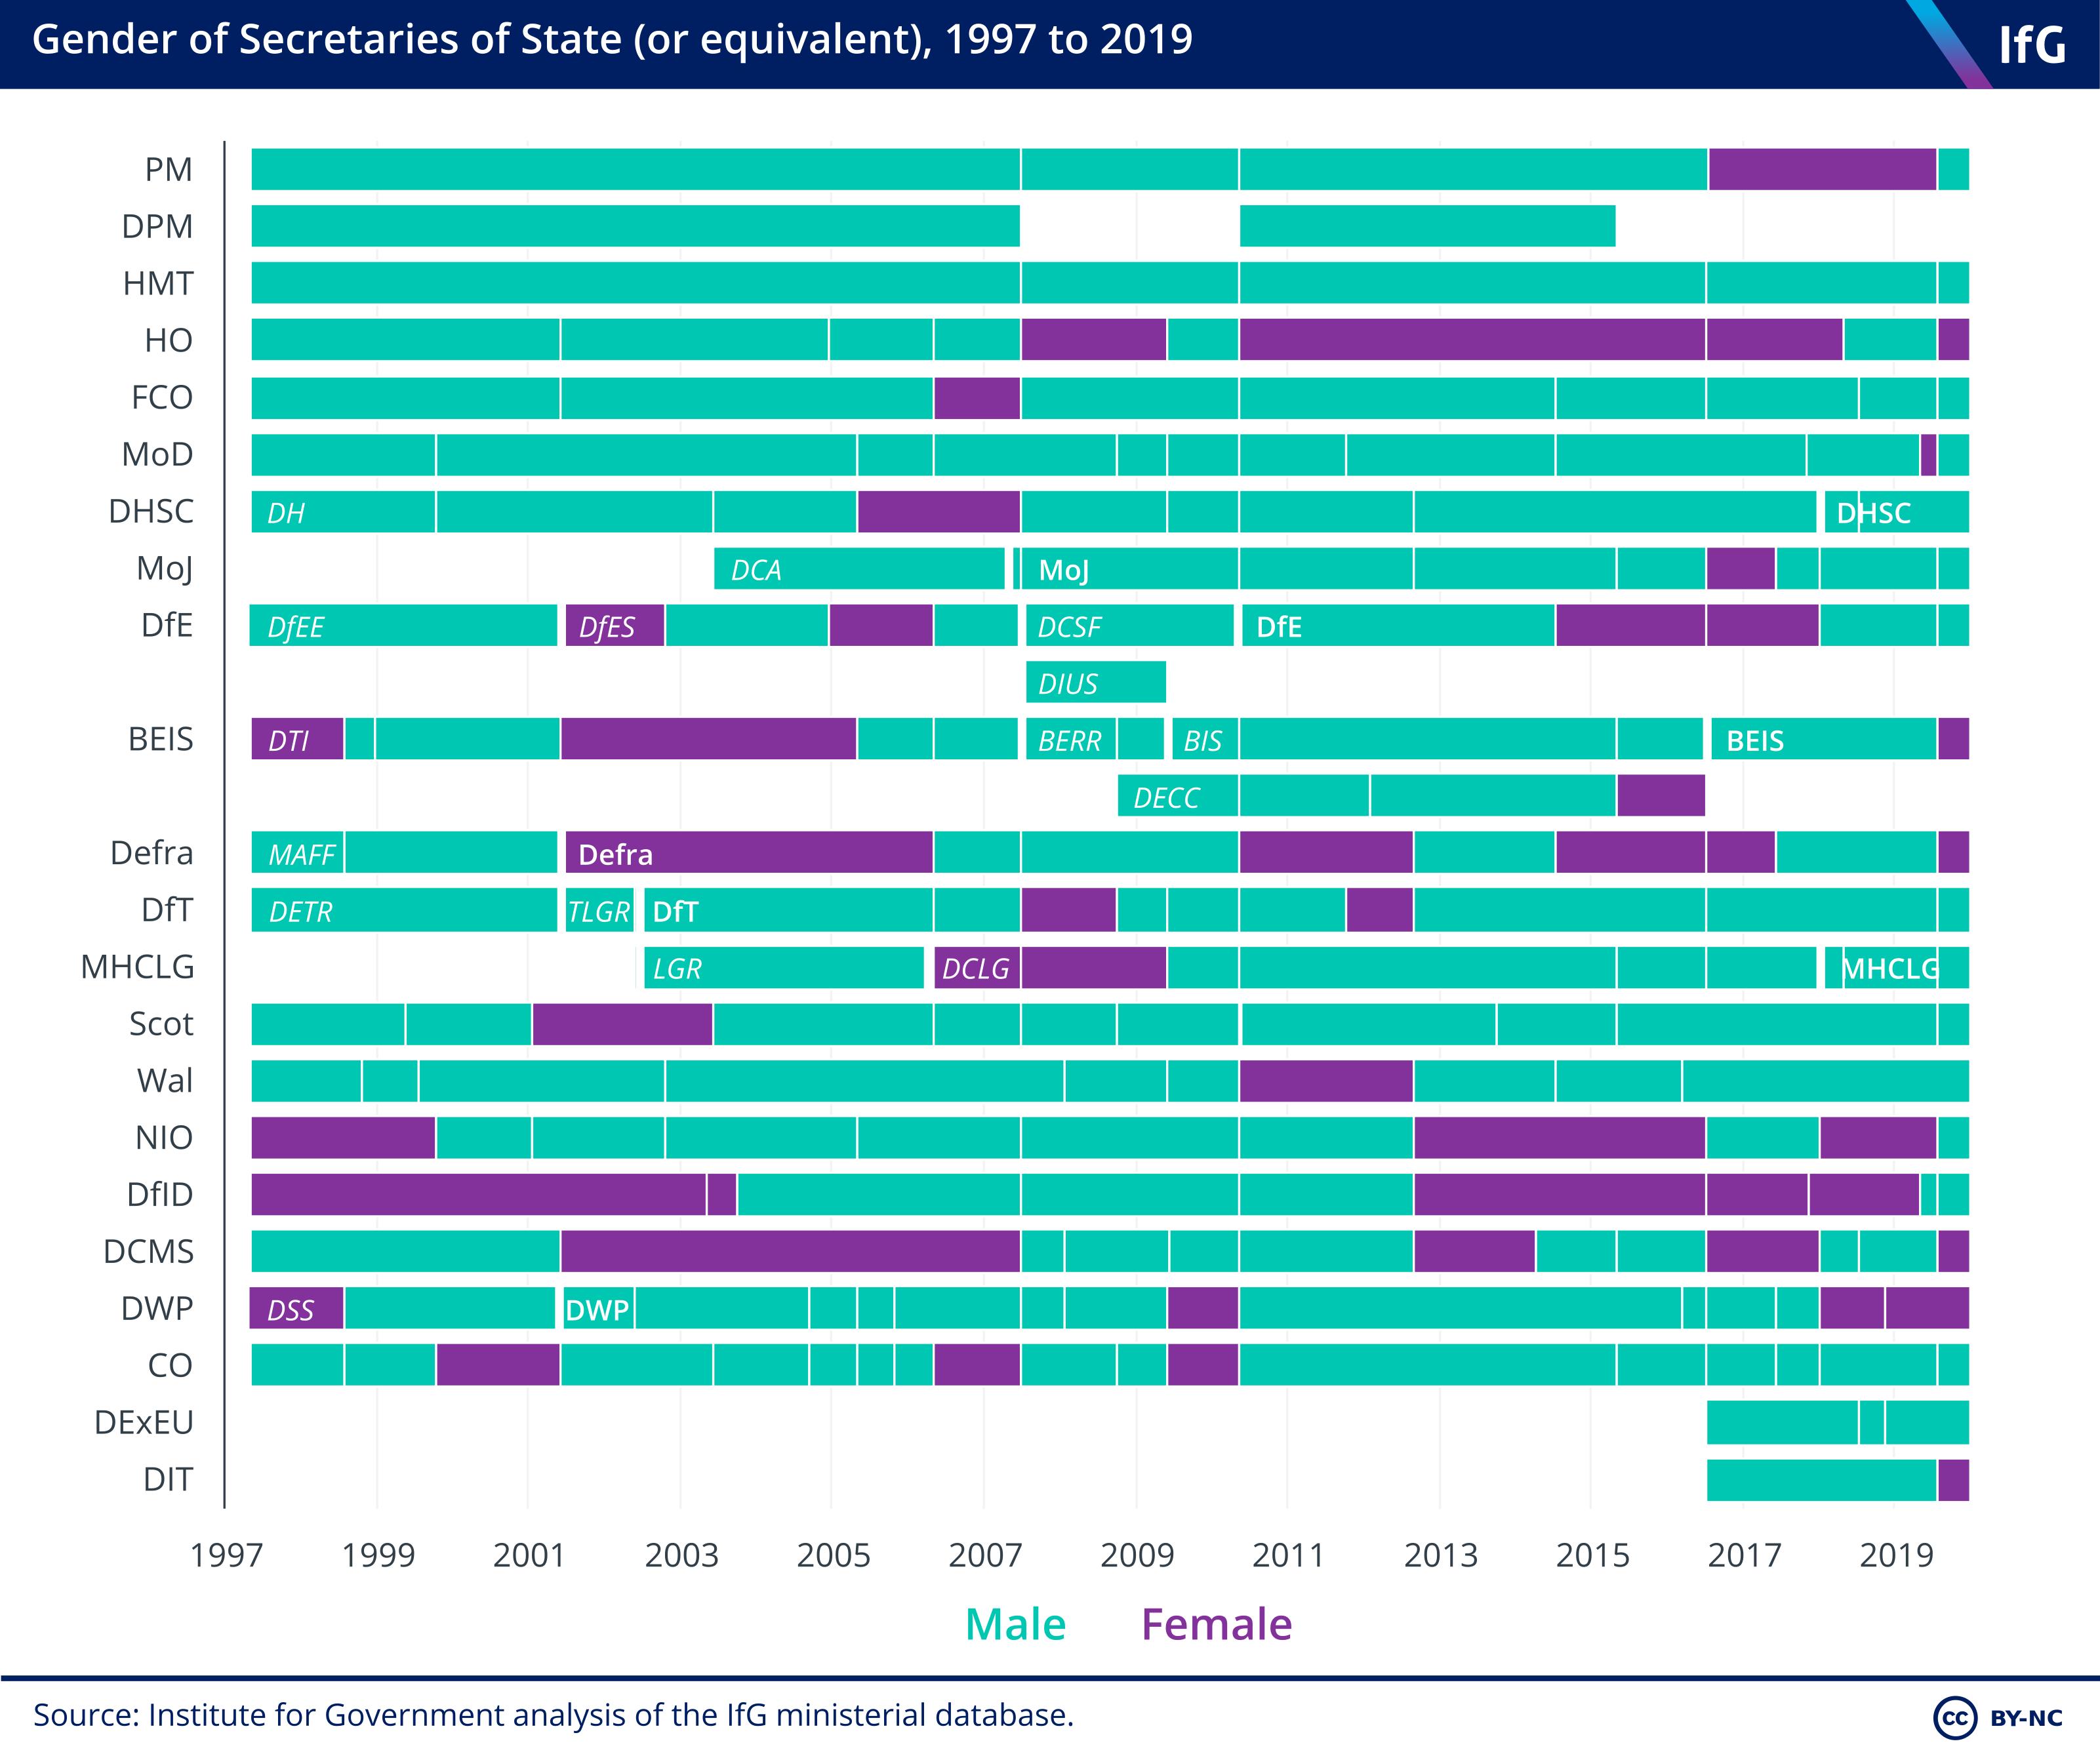 SoS gender 1997 to 2019 (July)